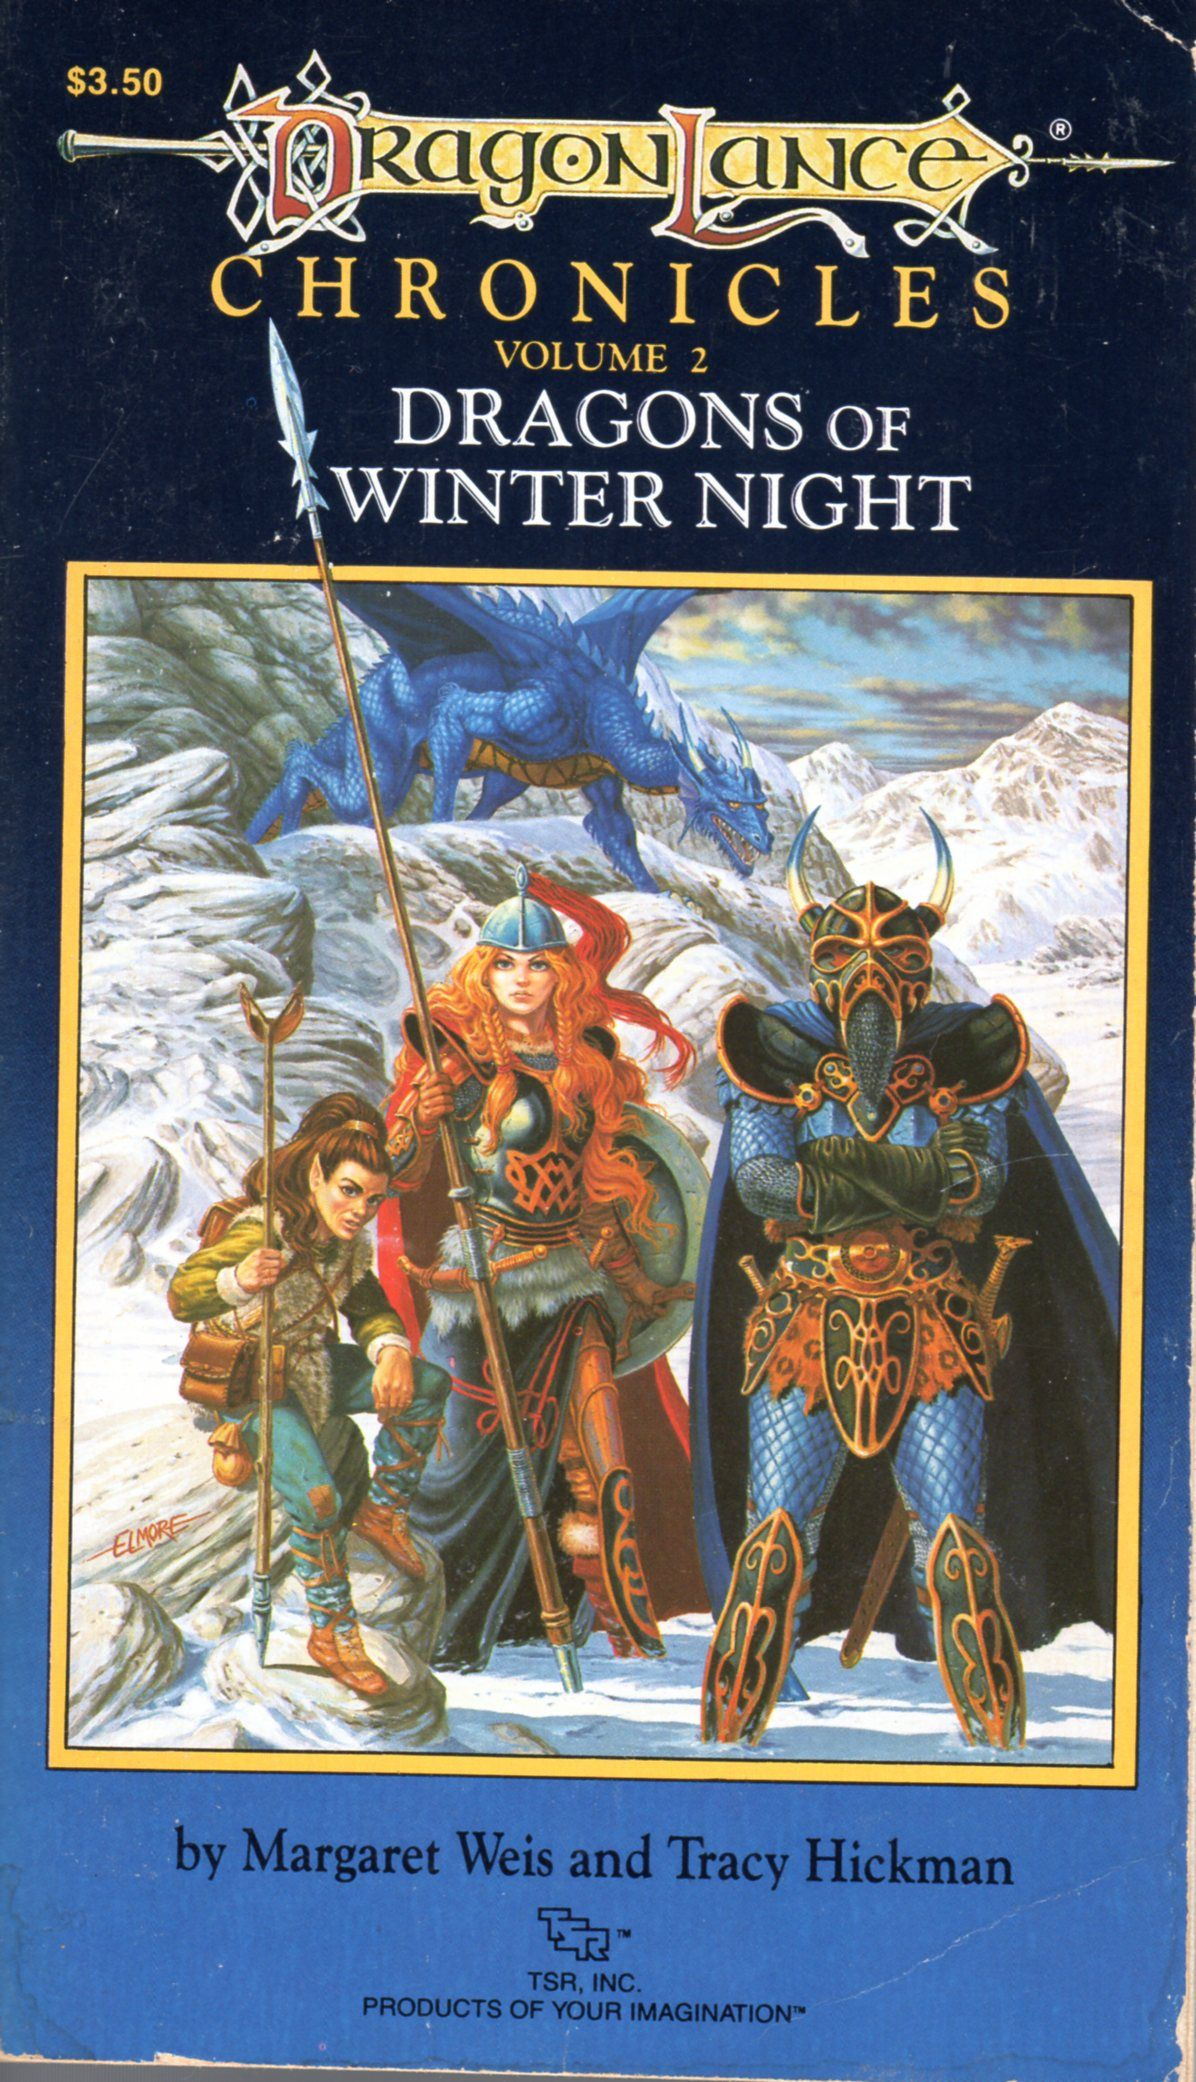 Dragonlance Chronicles Volume 2 Dragons Of Winter Night